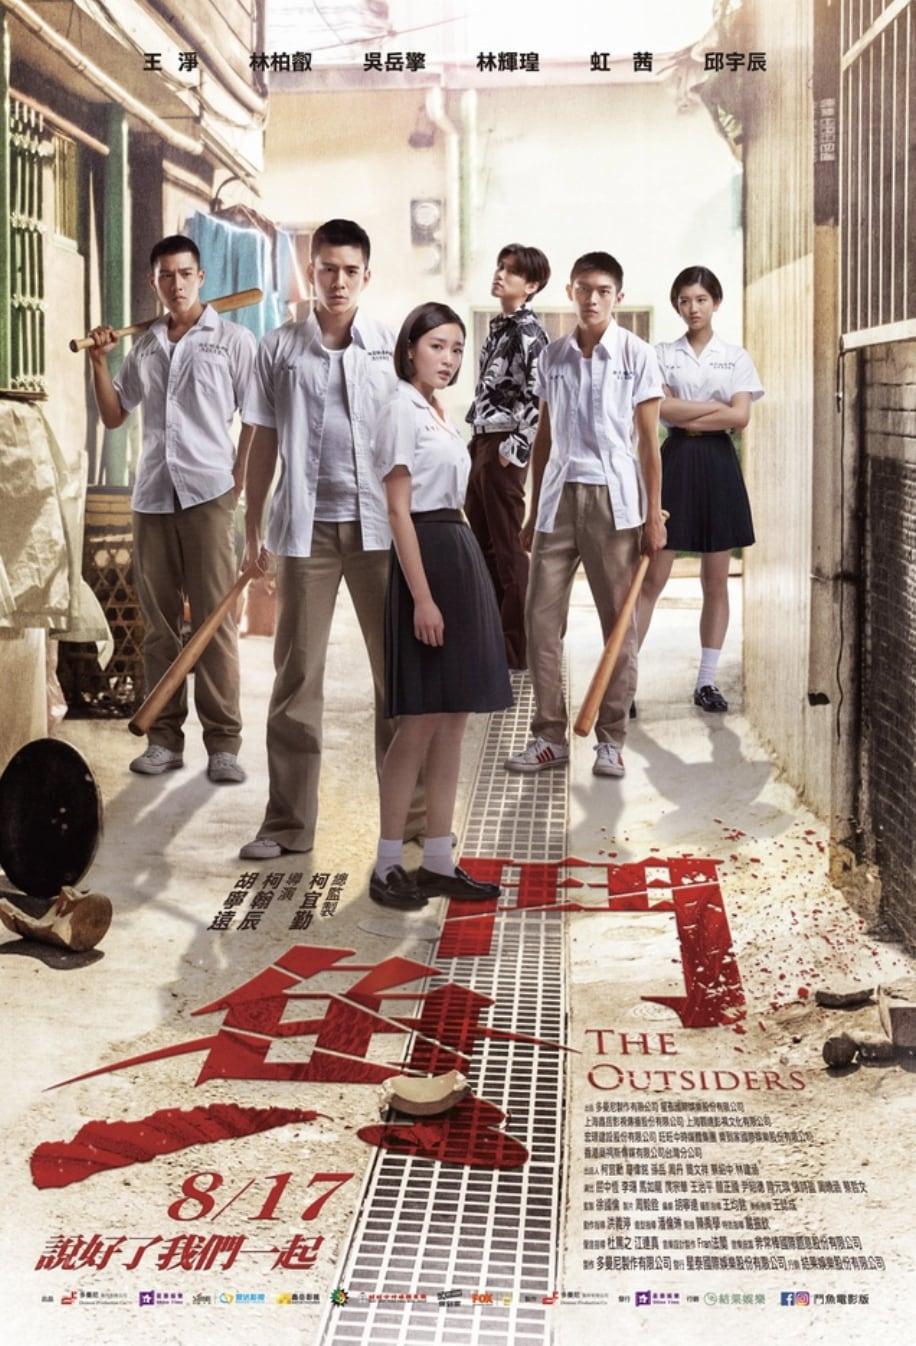 Bloggang.com : สมาชิกหมายเลข 4450491 - 鬥魚 (電影)線上看 2019最新電影 小鴨影音 